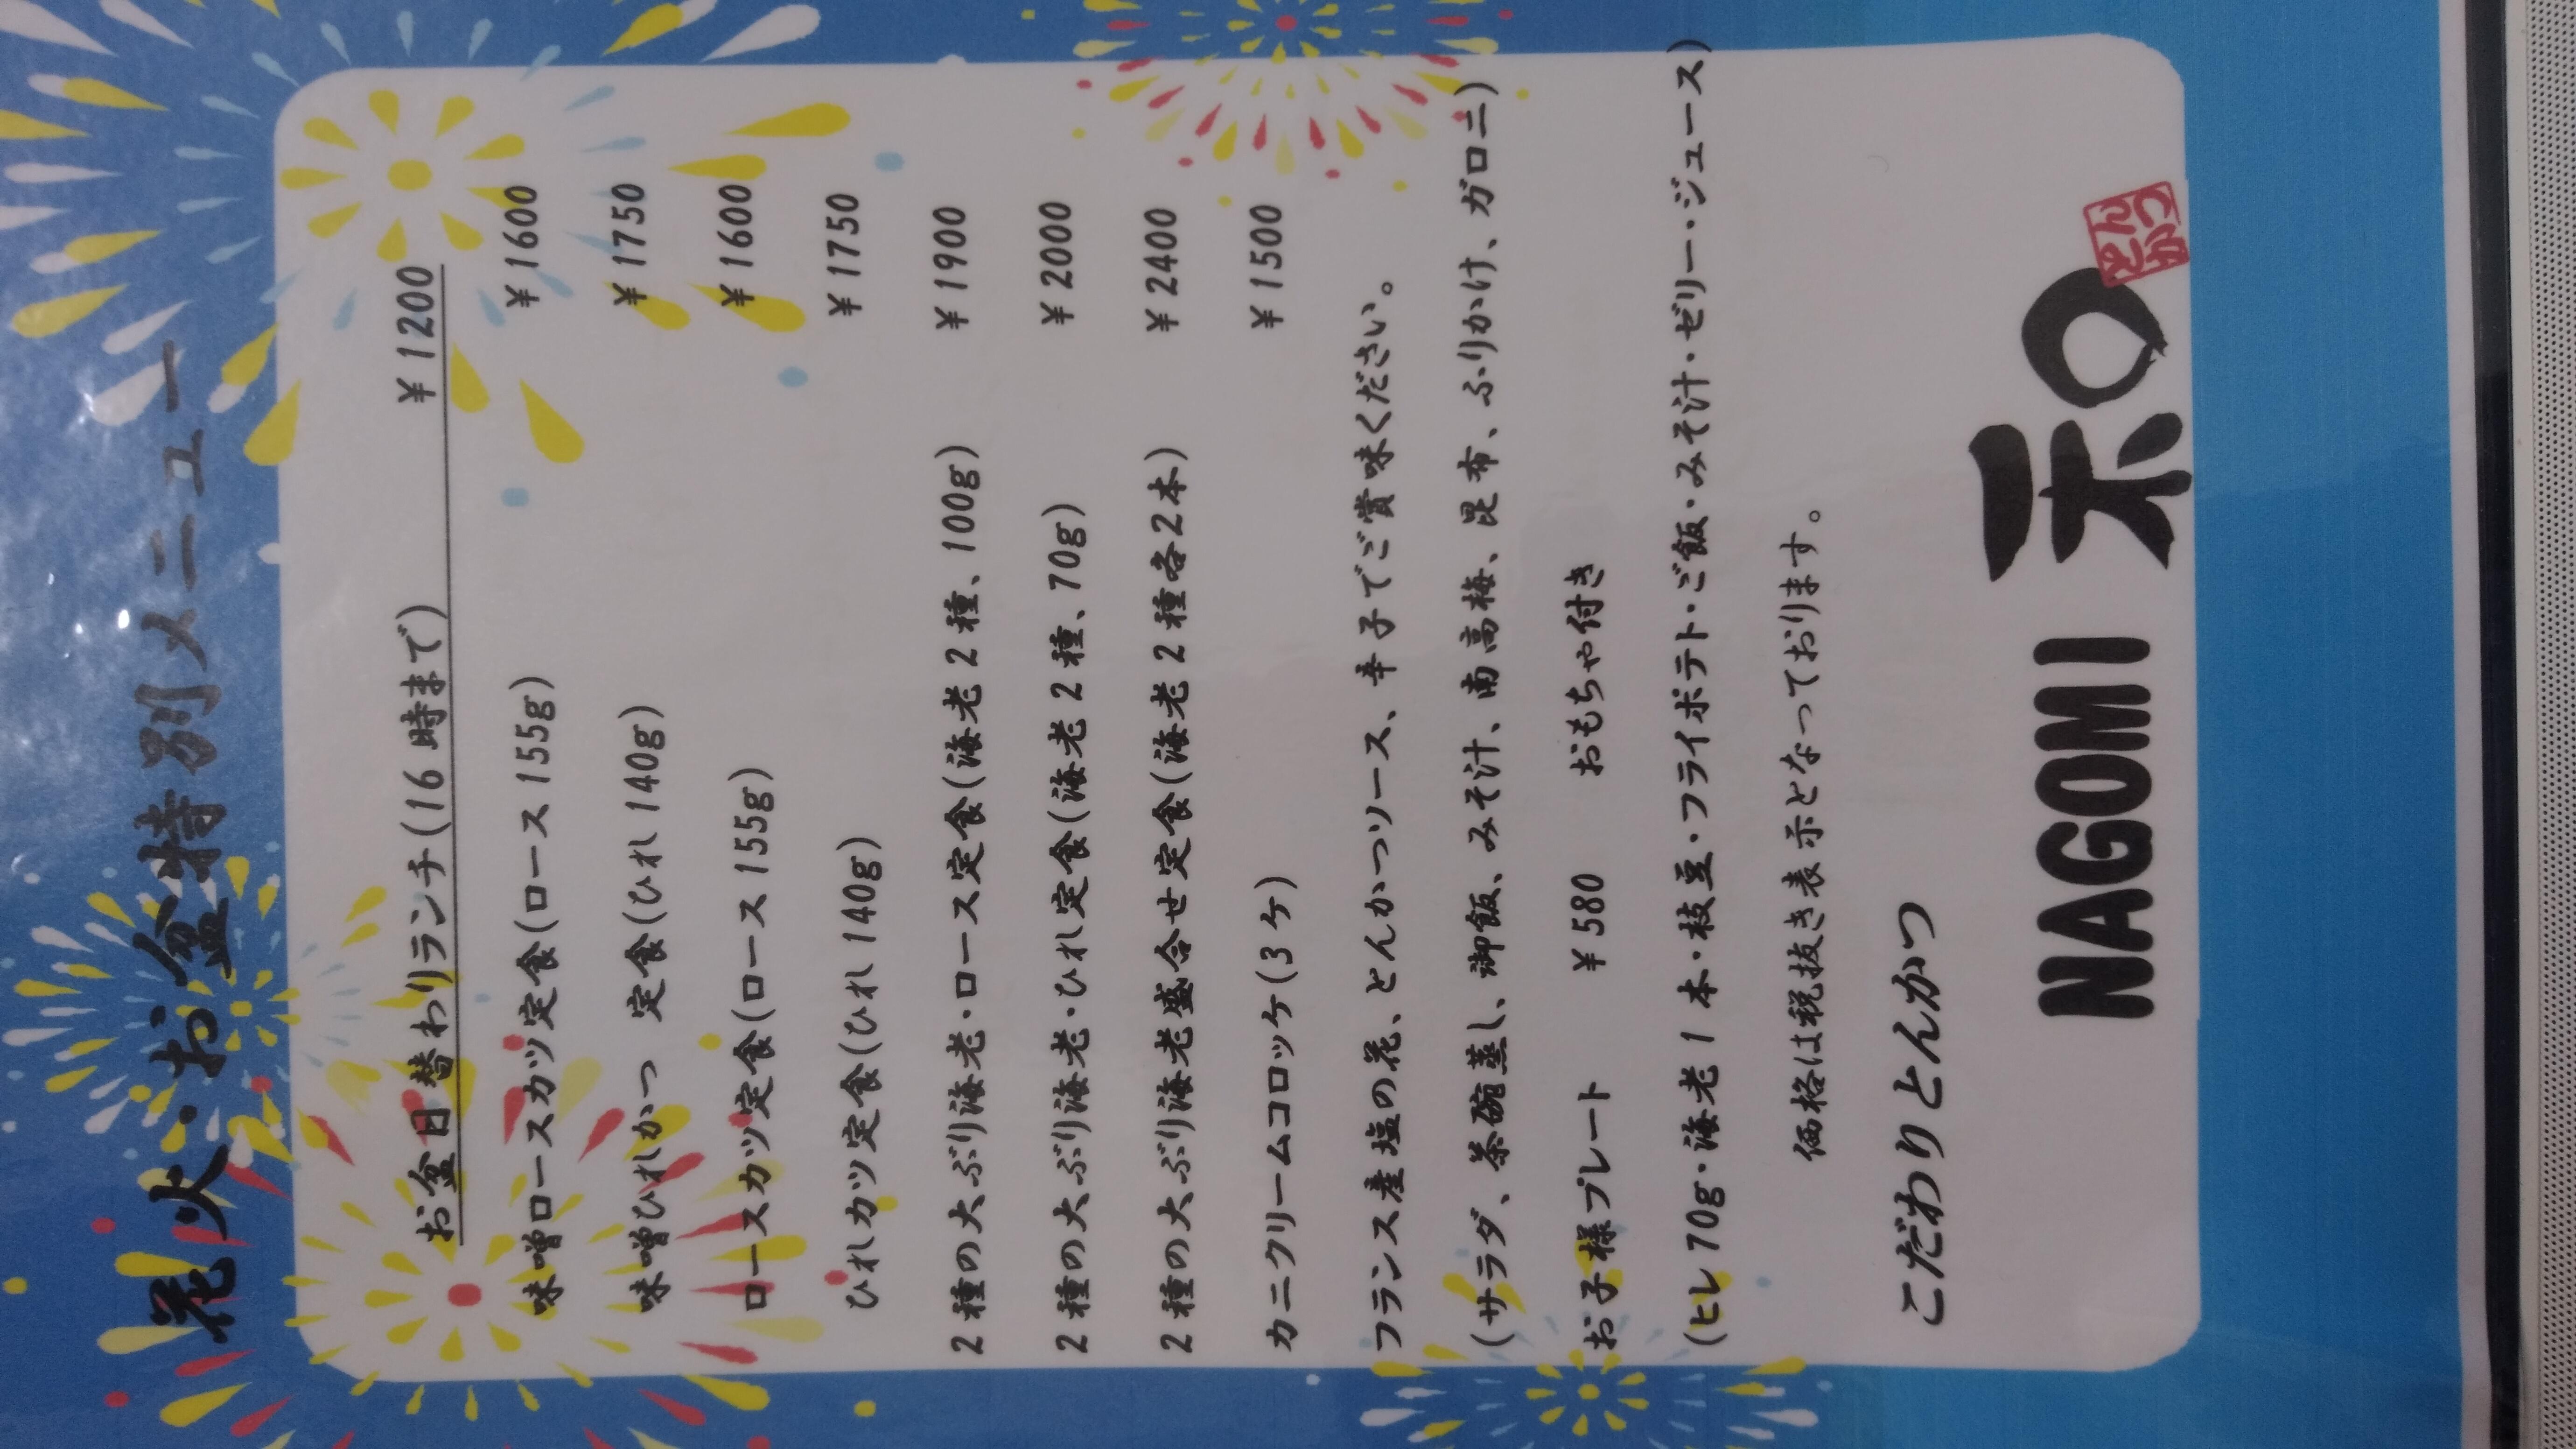 http://www.tonkatsu-nagomi.com/images/DSC_0540.jpg